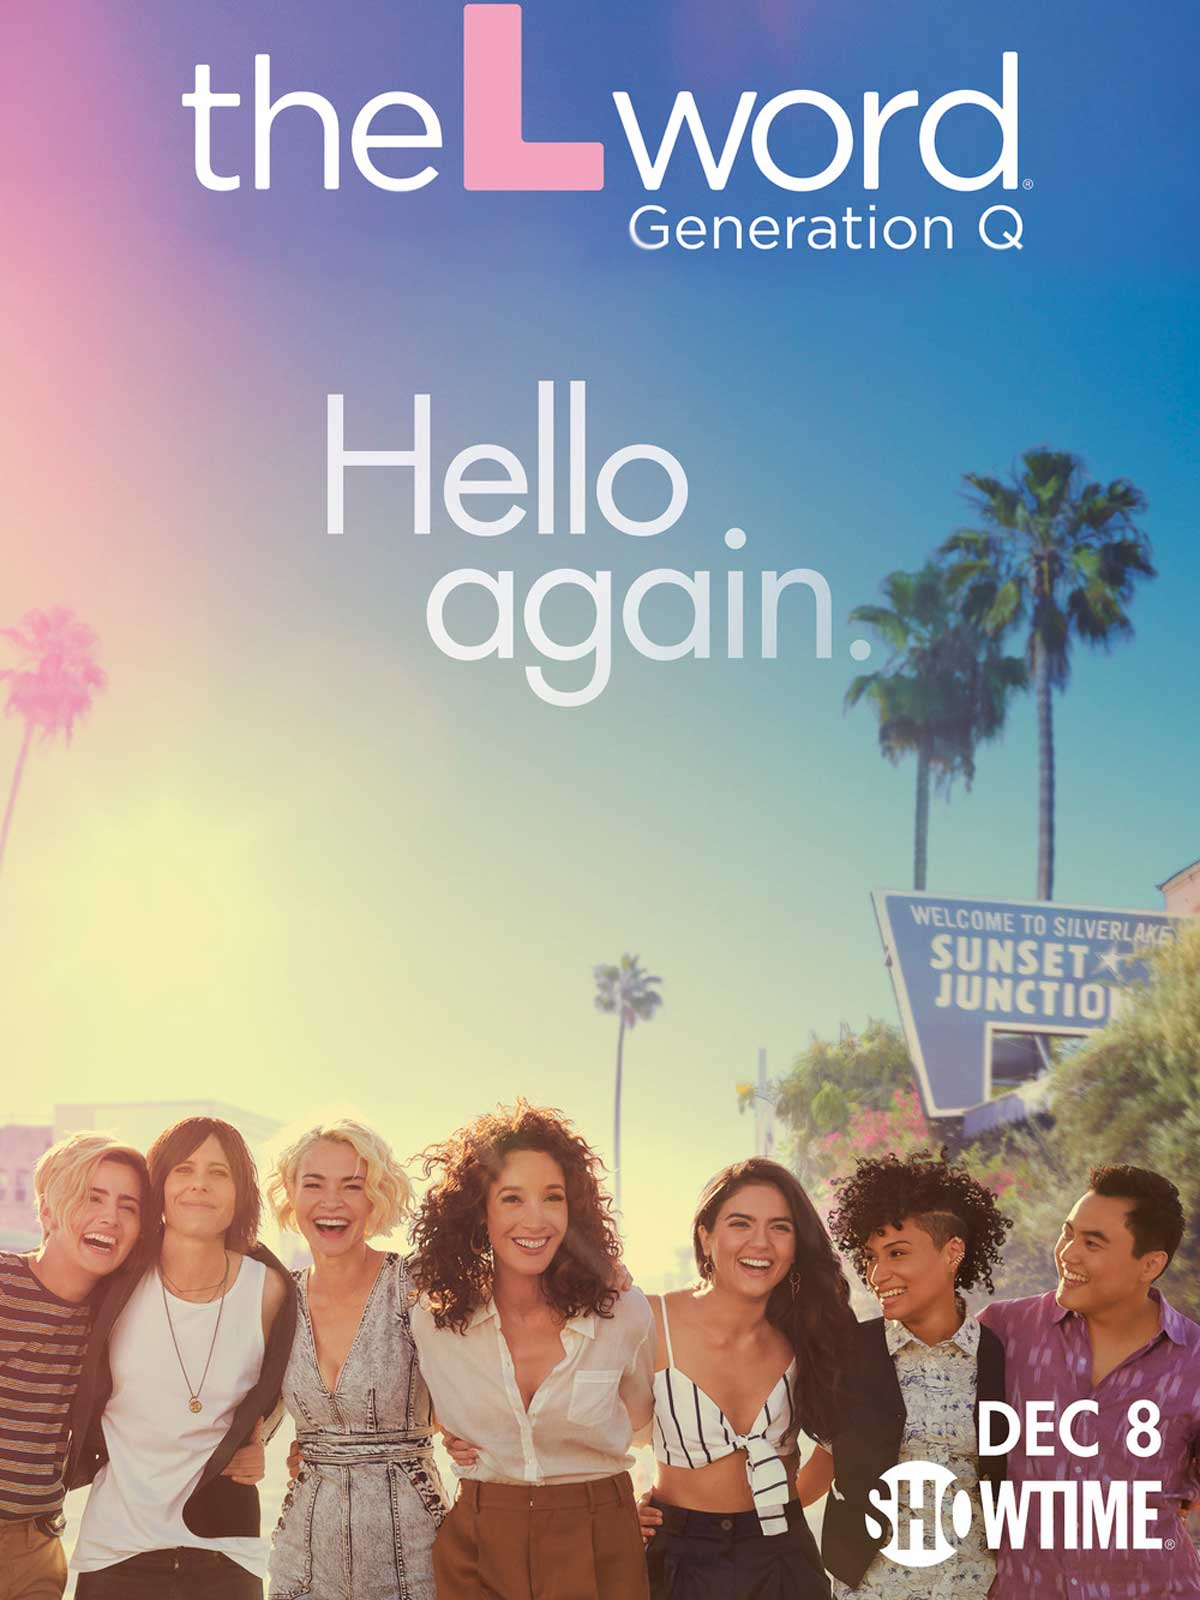 Download Séries The L Word: Generation Q 2ª Temporada Torrent 2021 Qualidade Hd